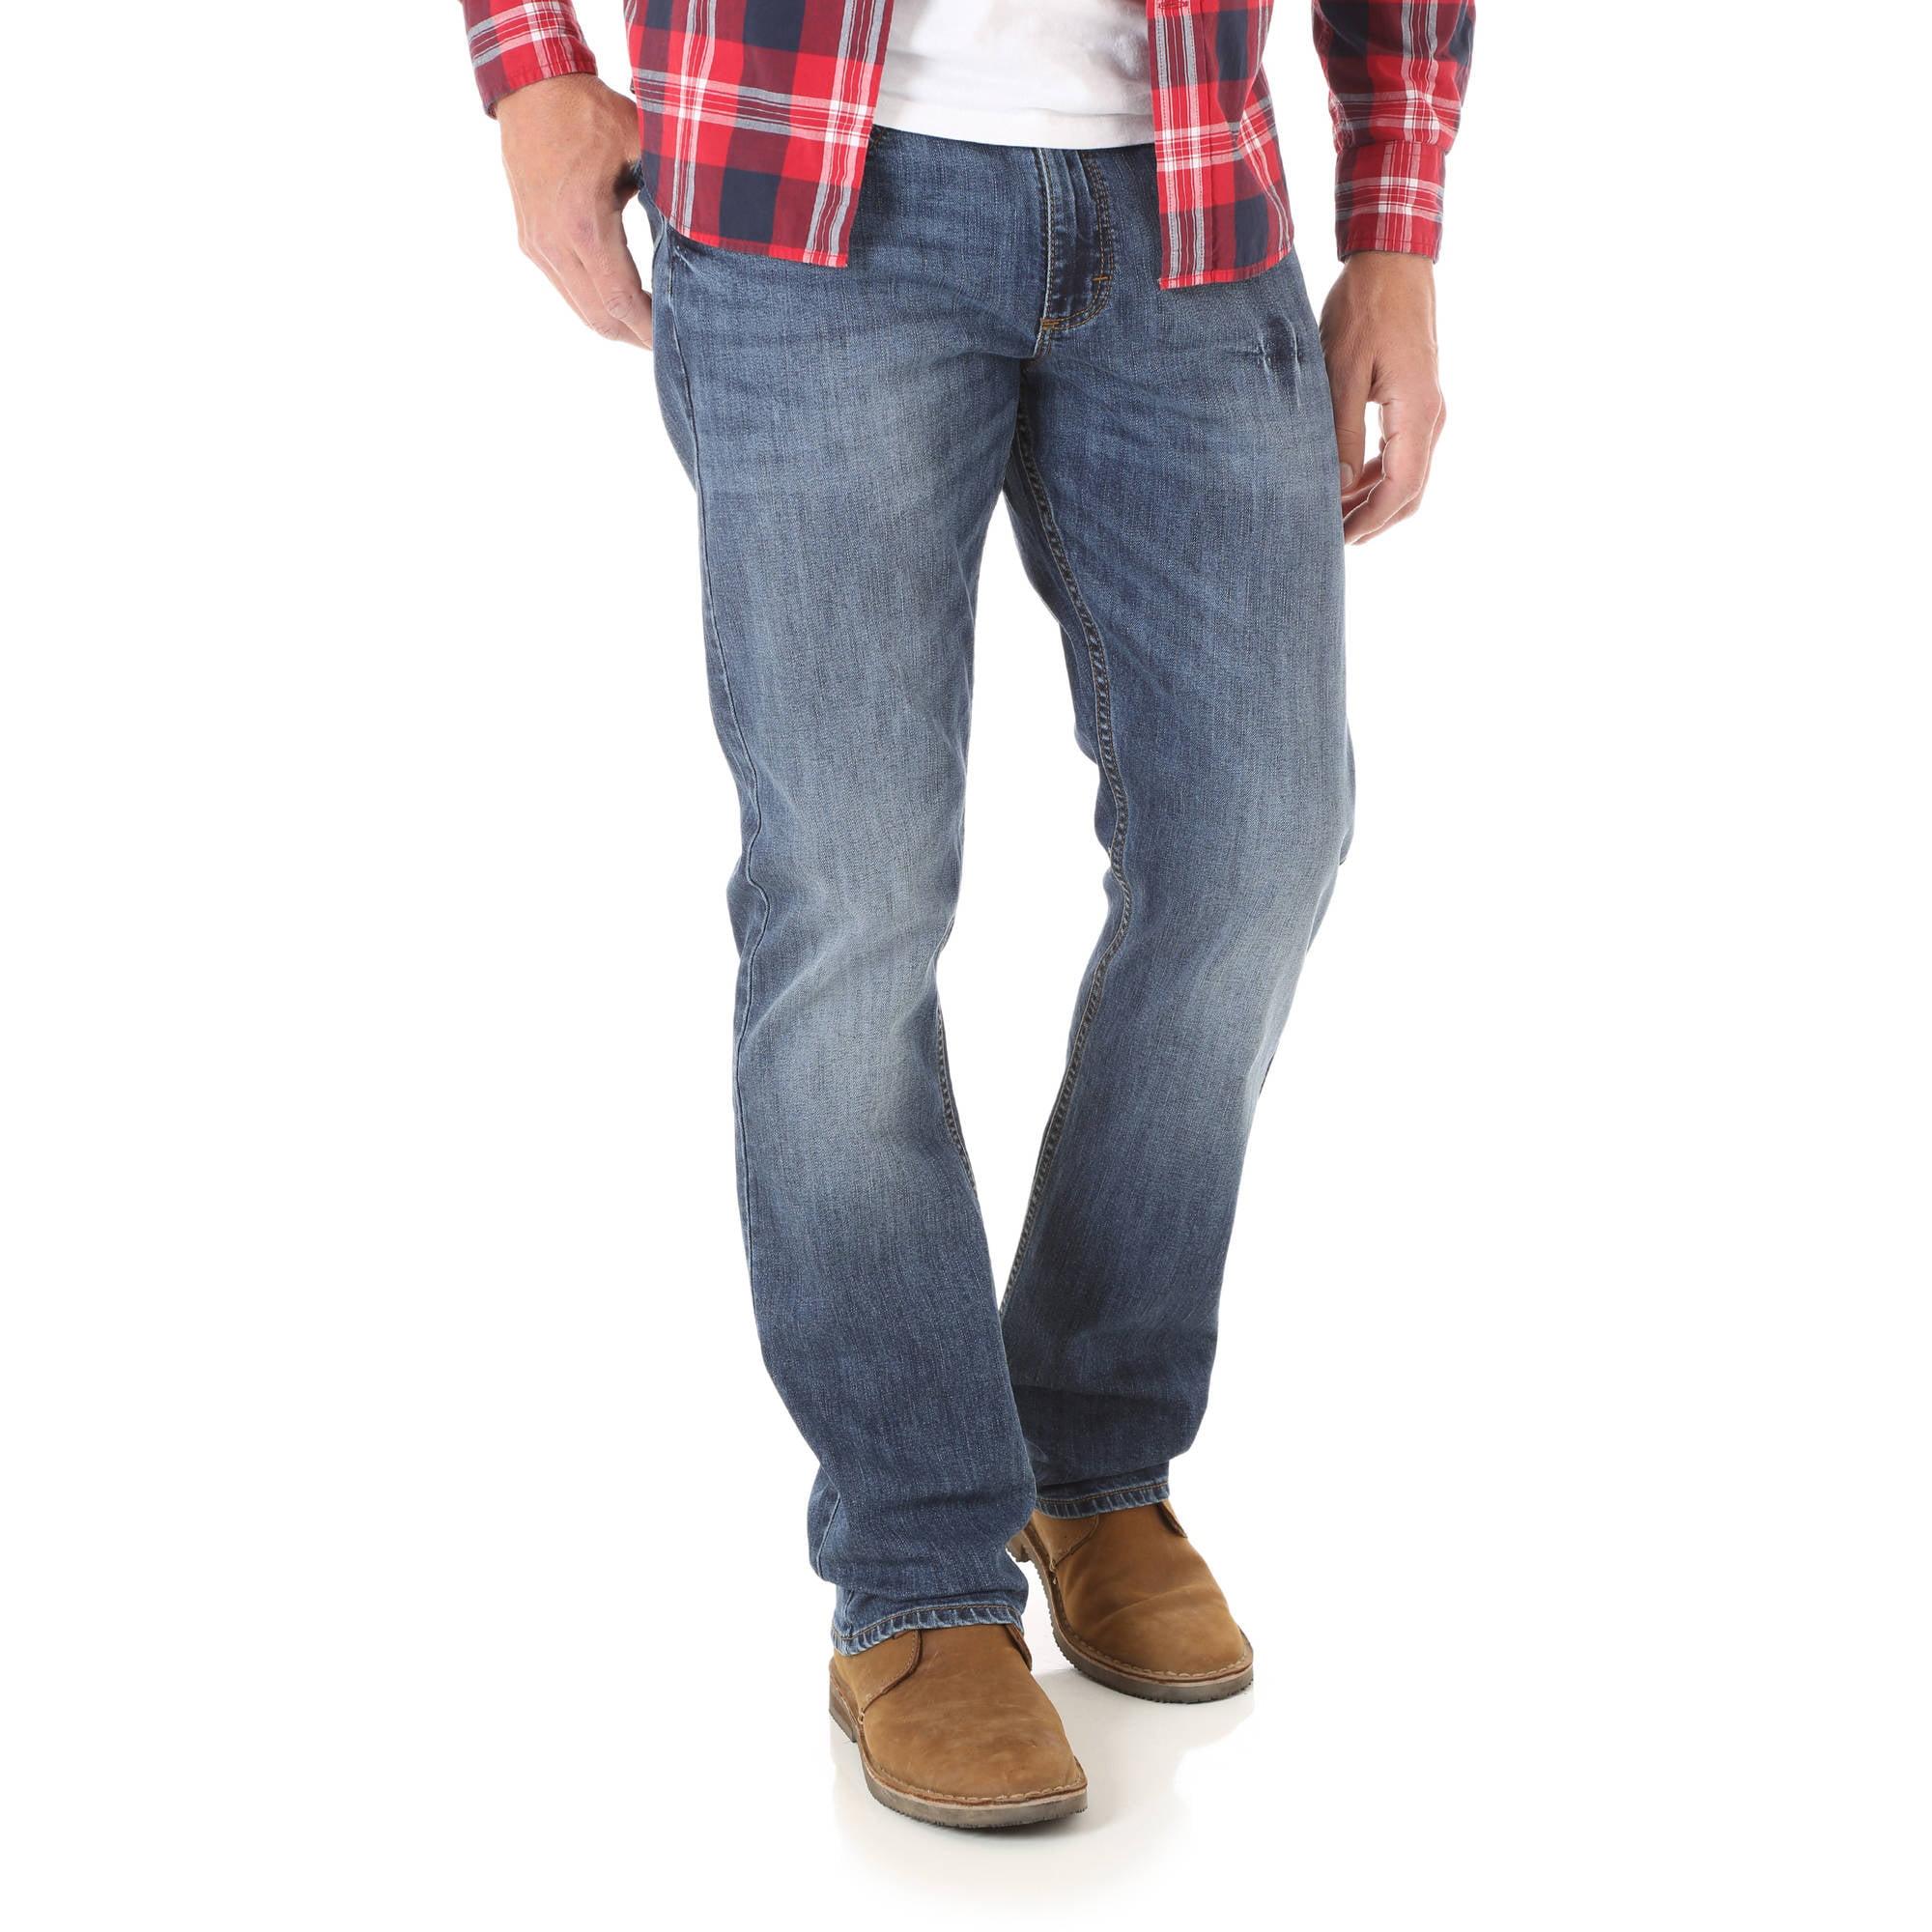 comfort stretch shorts clothing jeans super comforter destruct denim vickie frayed liverpool waist company in lyst ridgecrest vintage